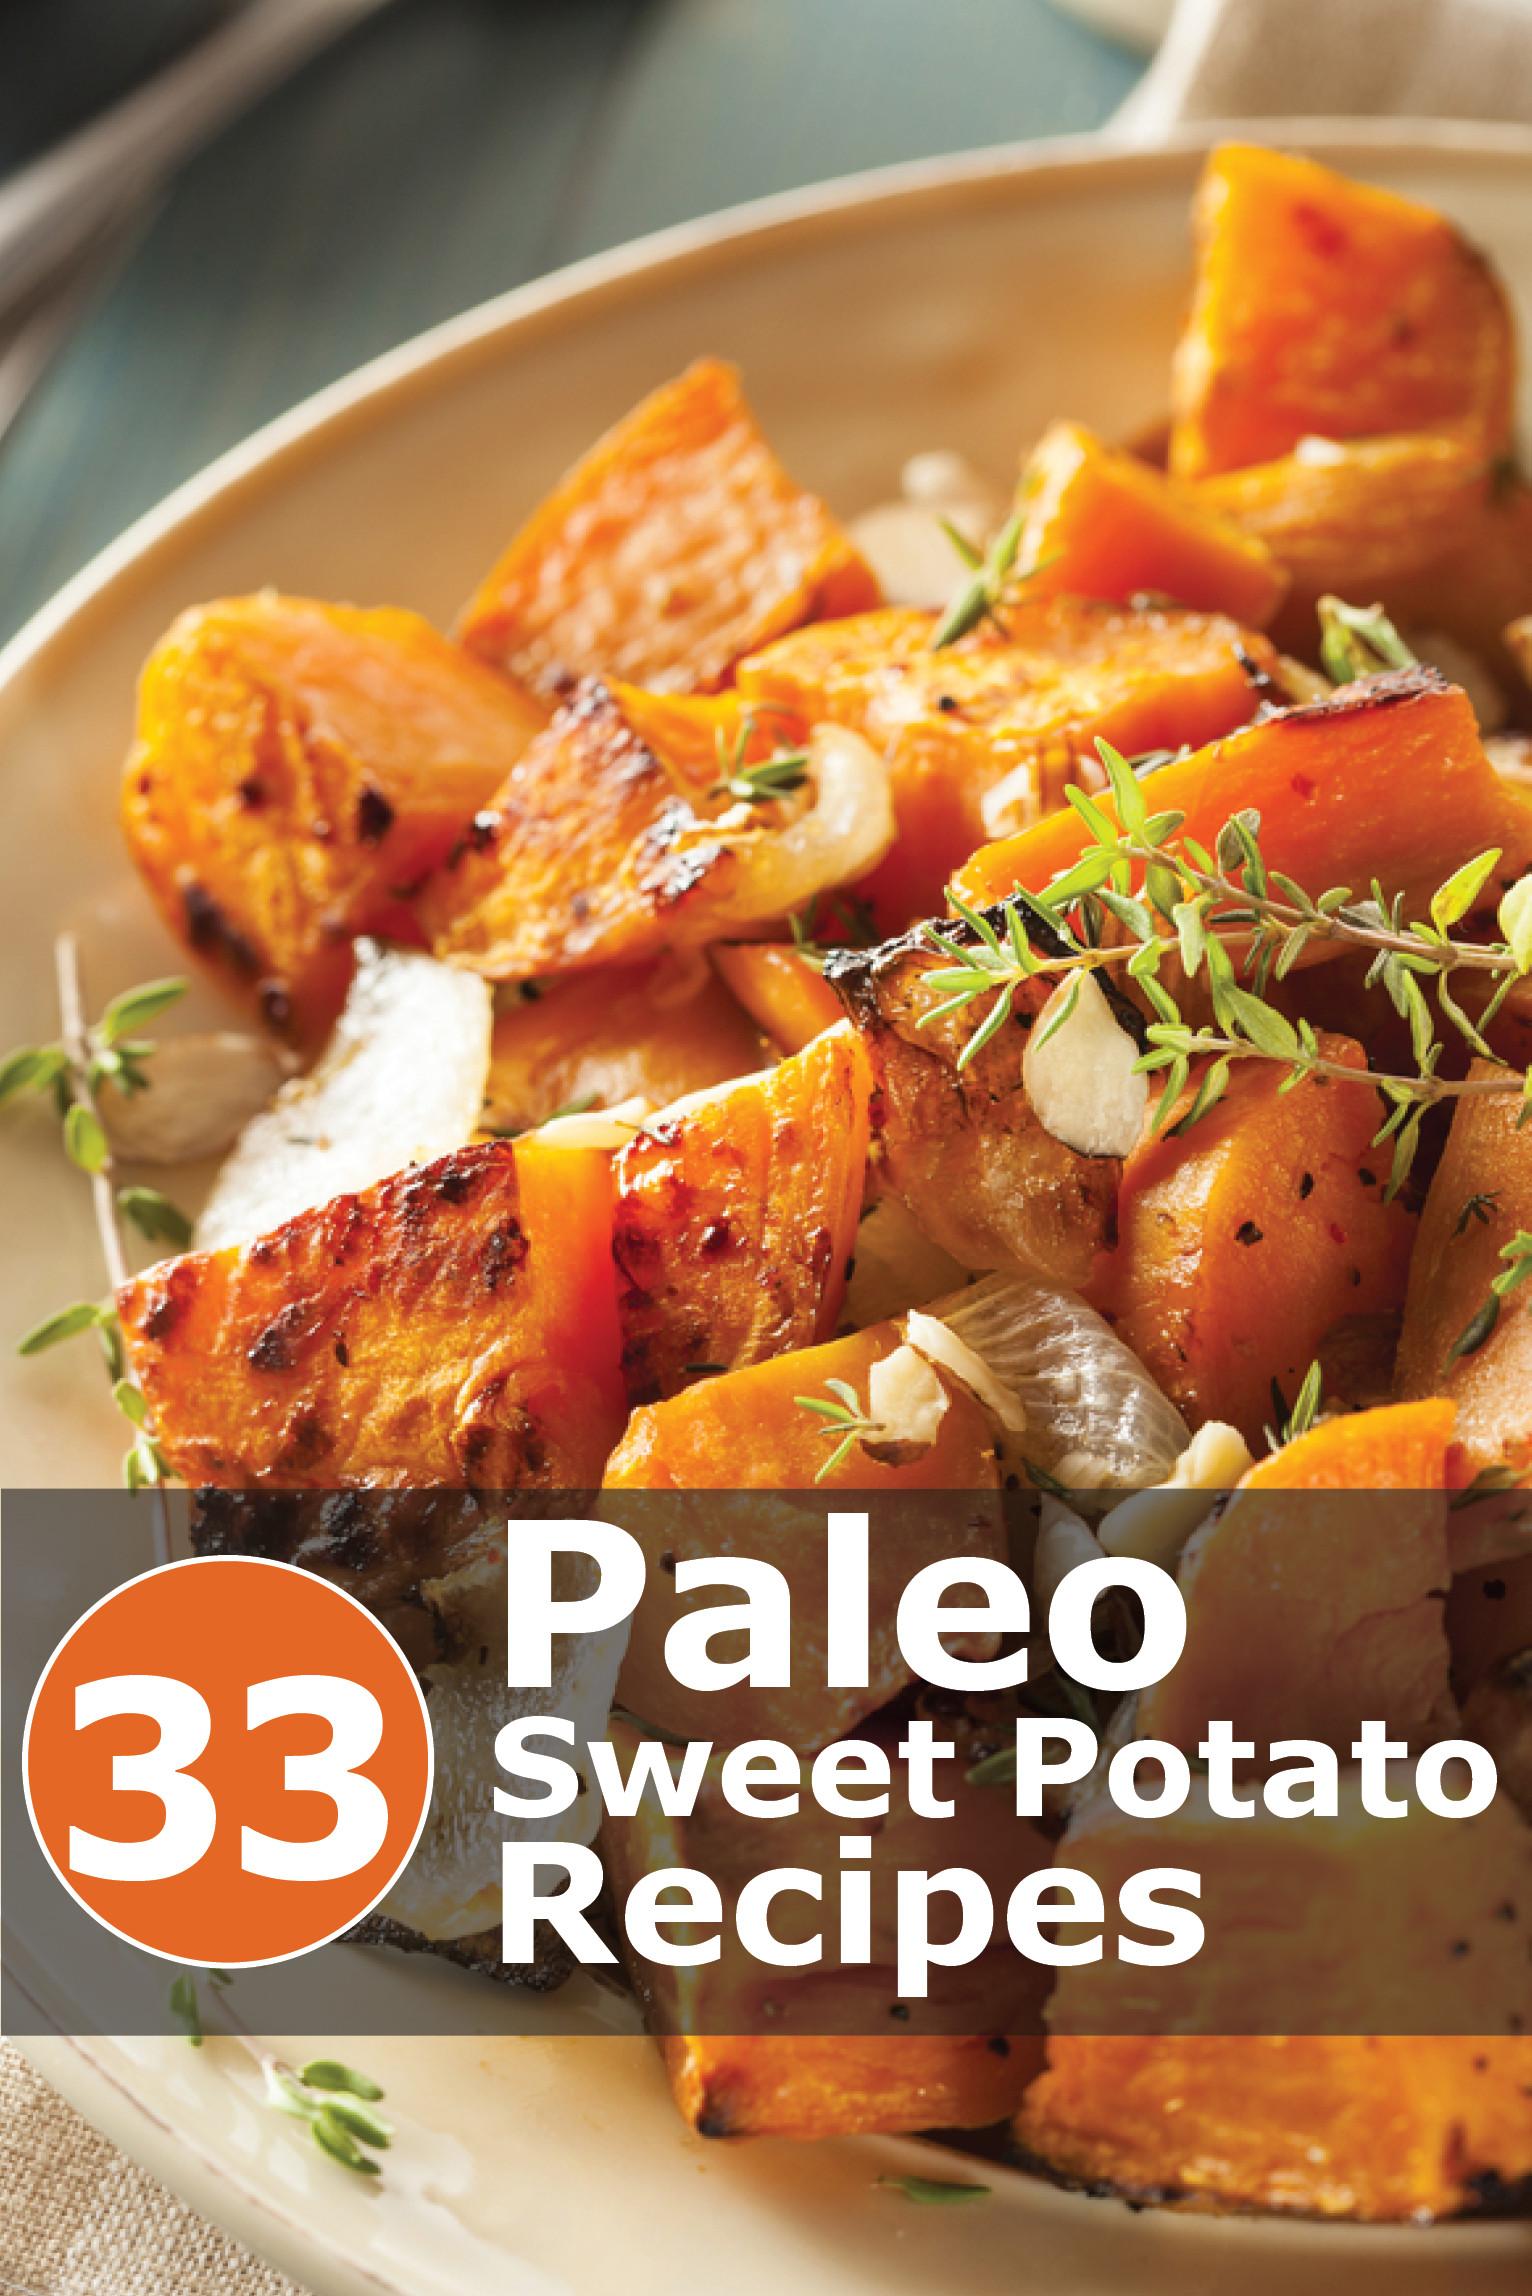 Sweet Potato Paleo  33 Paleo Nourishing Sweet Potato Recipes anyone can make